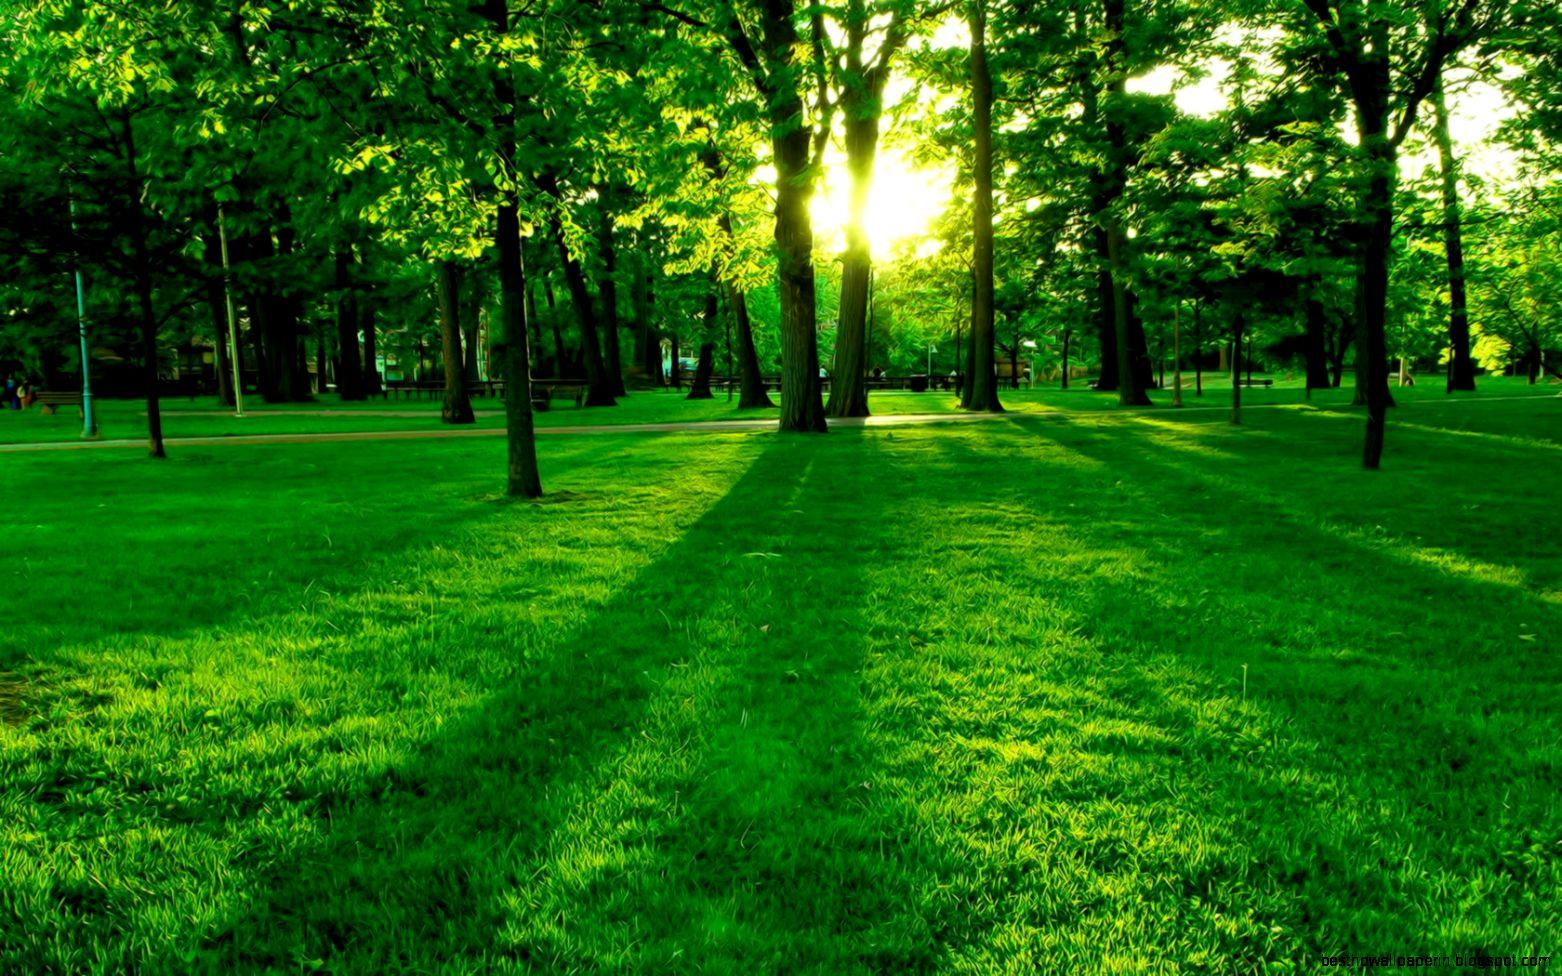 Landscape Wallpaper High Definition | Best HD Wallpapers - photo#11